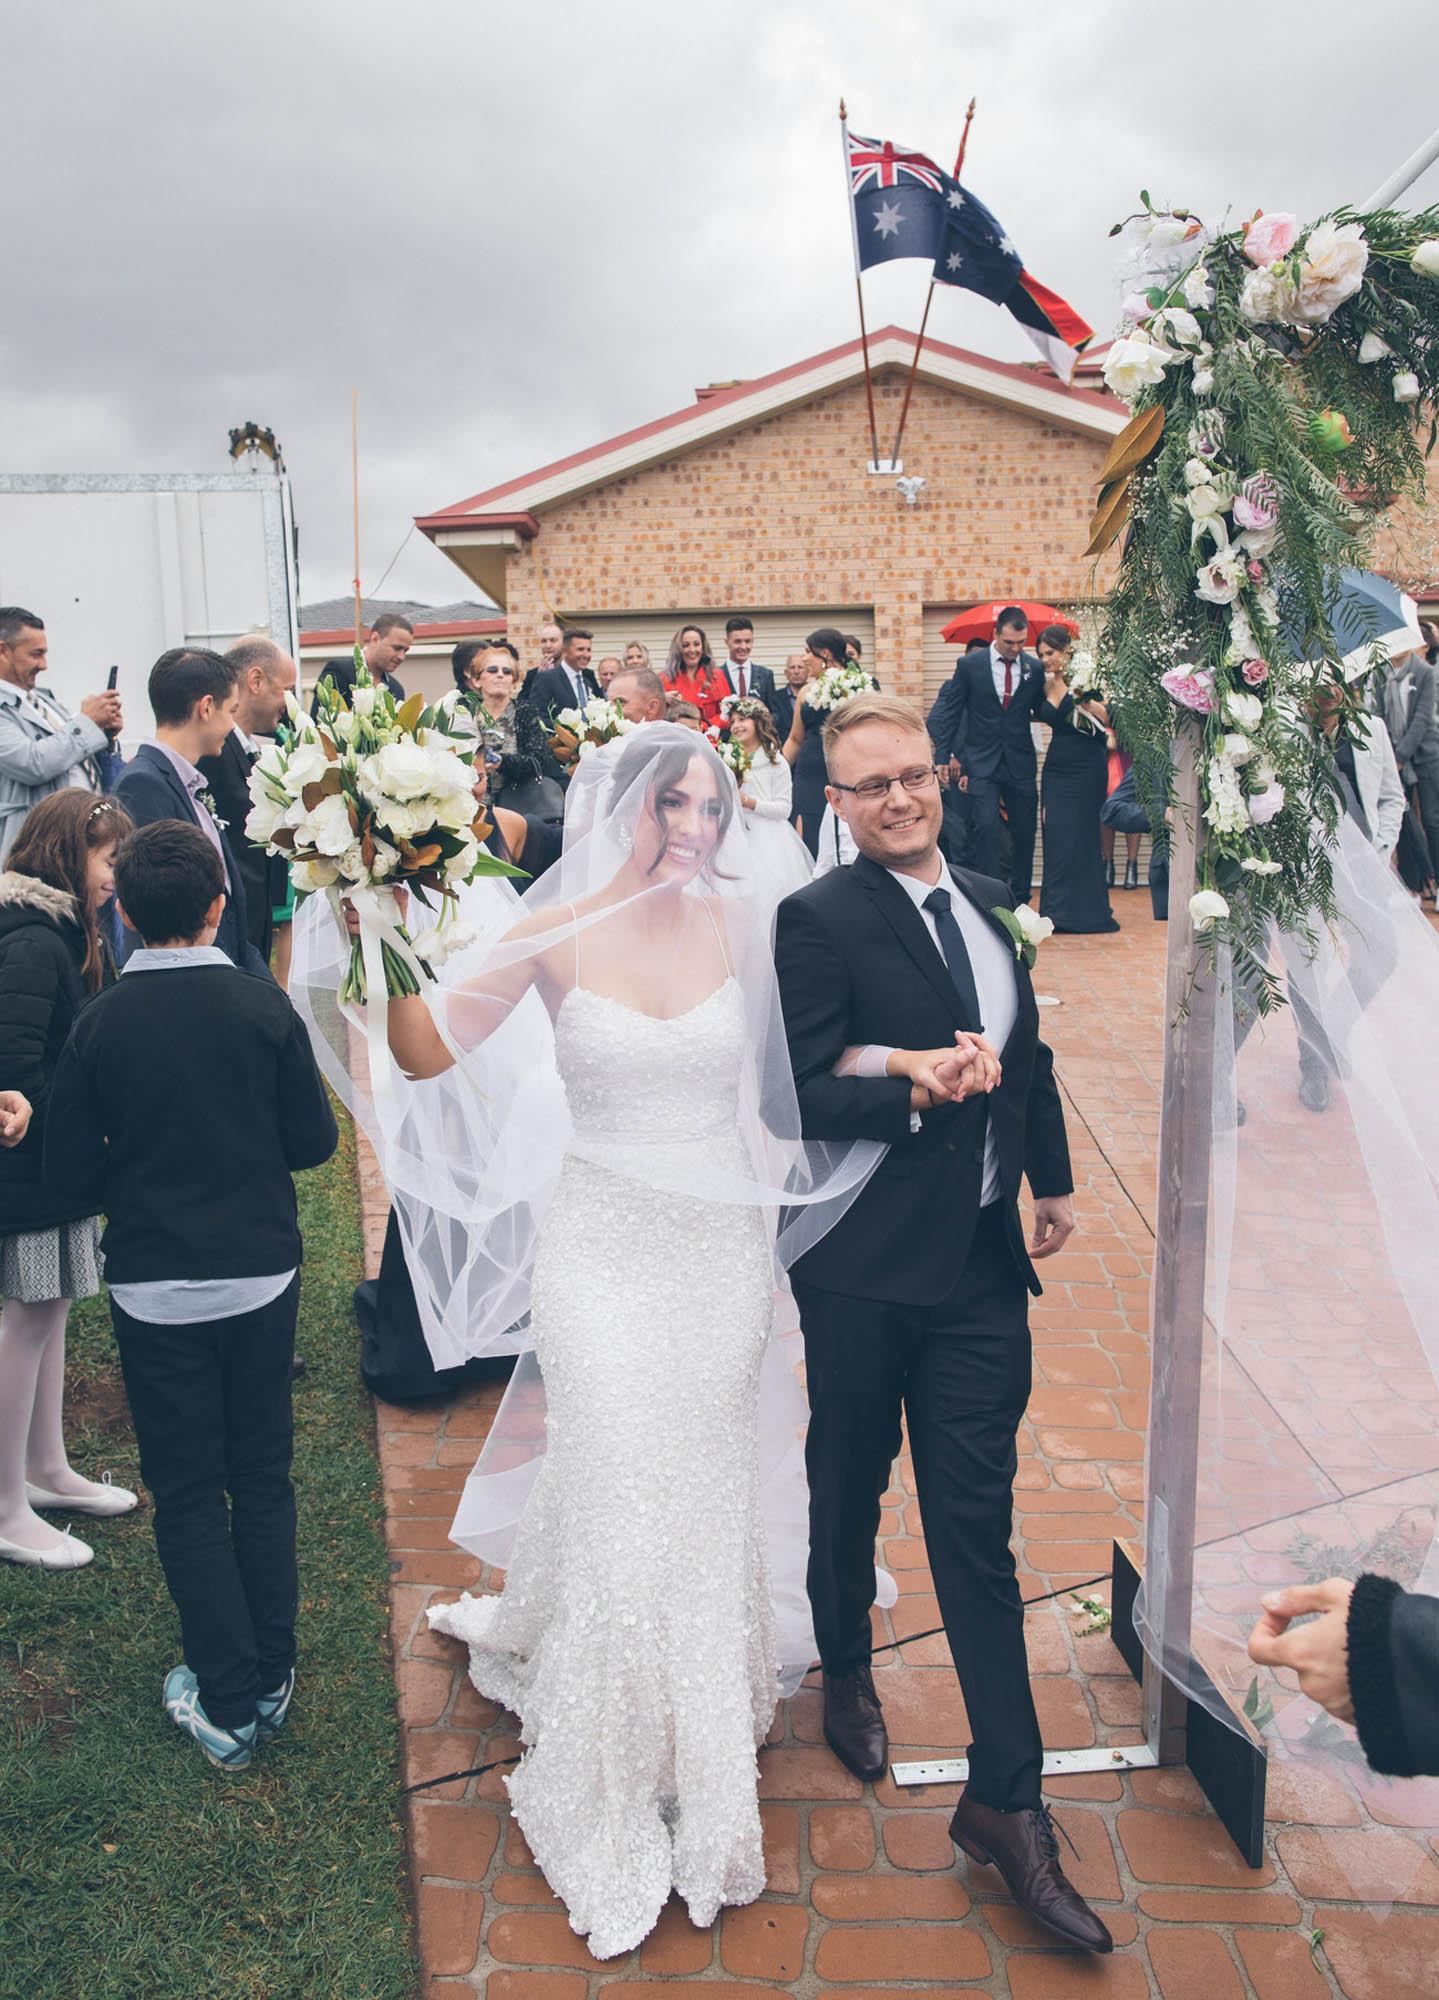 MacDougall-Photography-Sydney-Wedding-Photographers-18.jpg